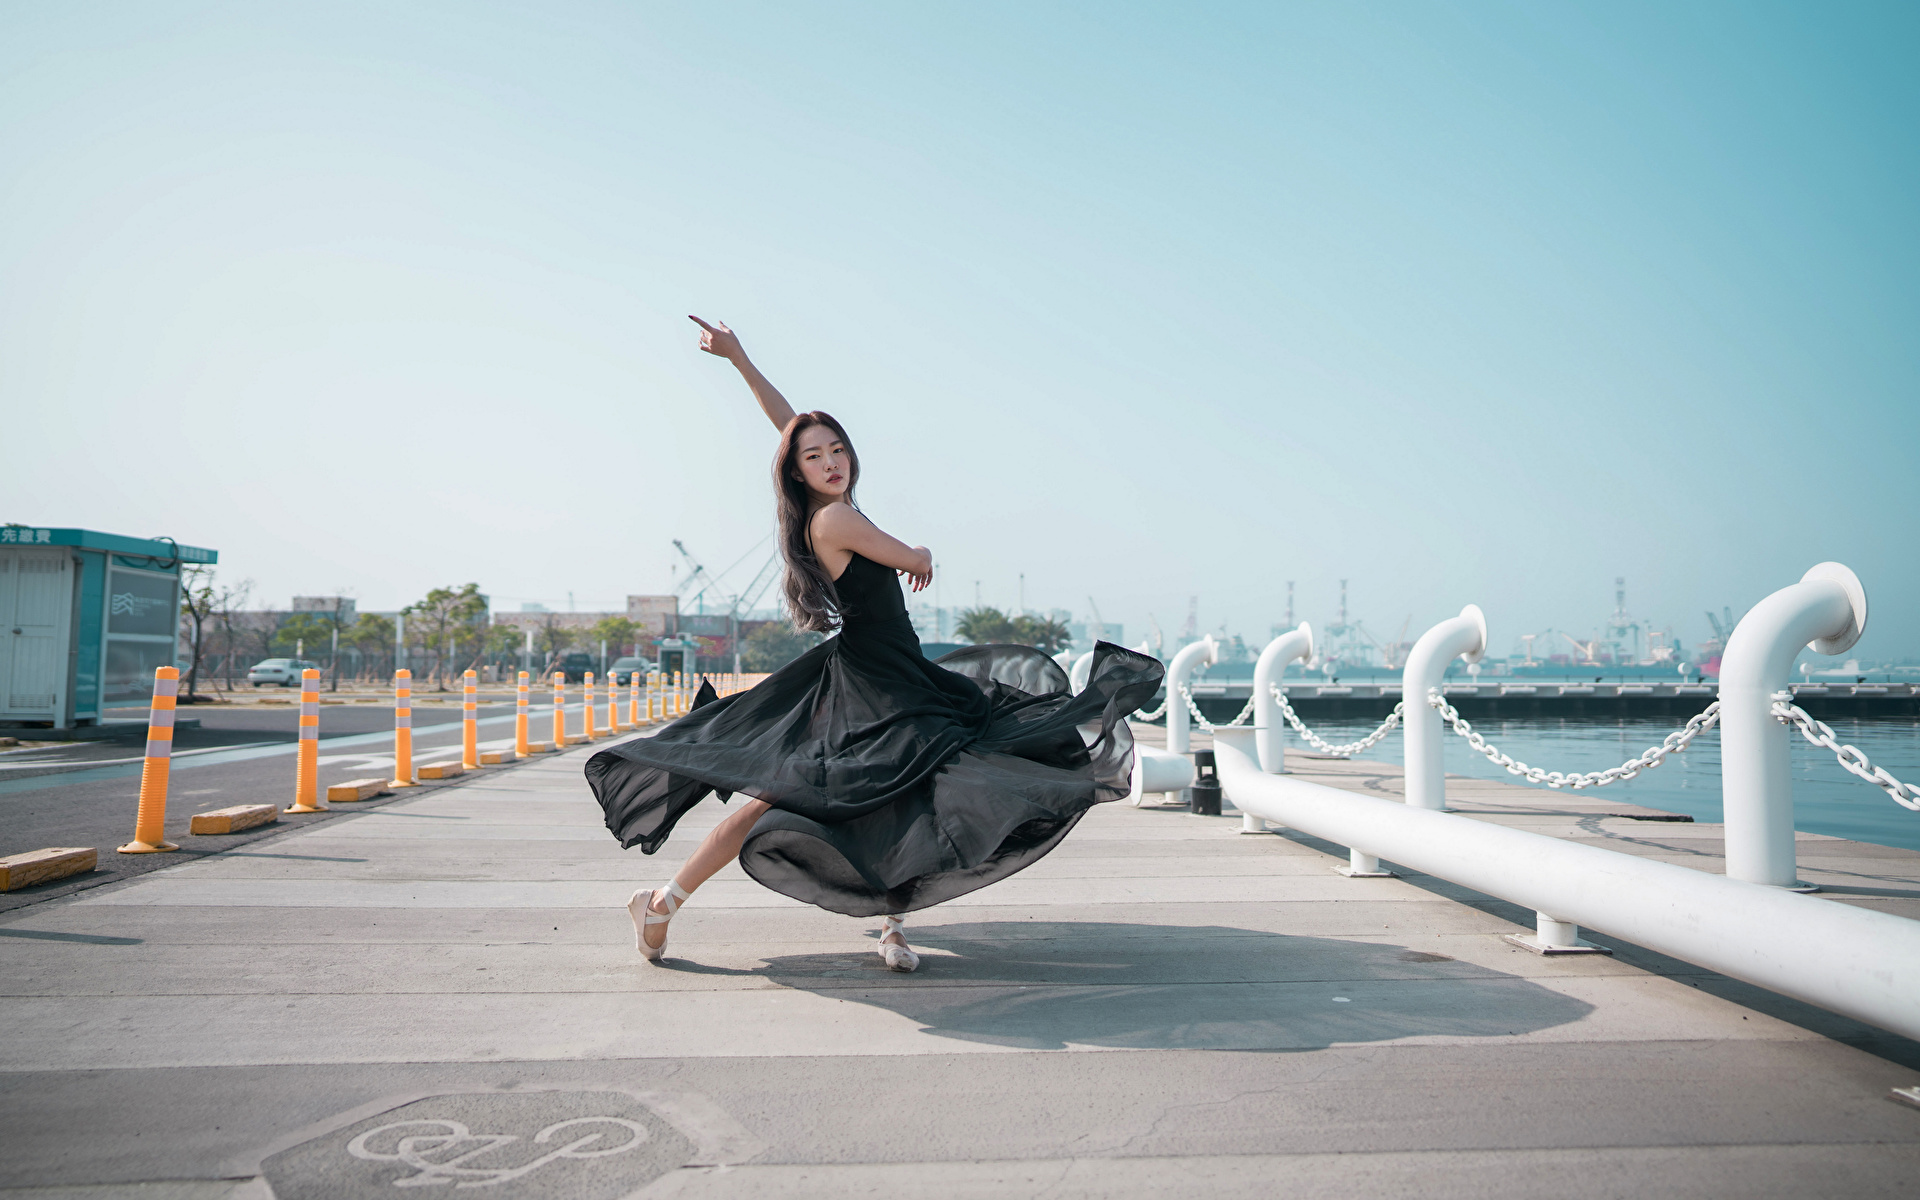 Wallpaper Ballet Dancing Girls Asiatic Waterfront Dress 1920x1200 Dance female young woman Asian gown frock